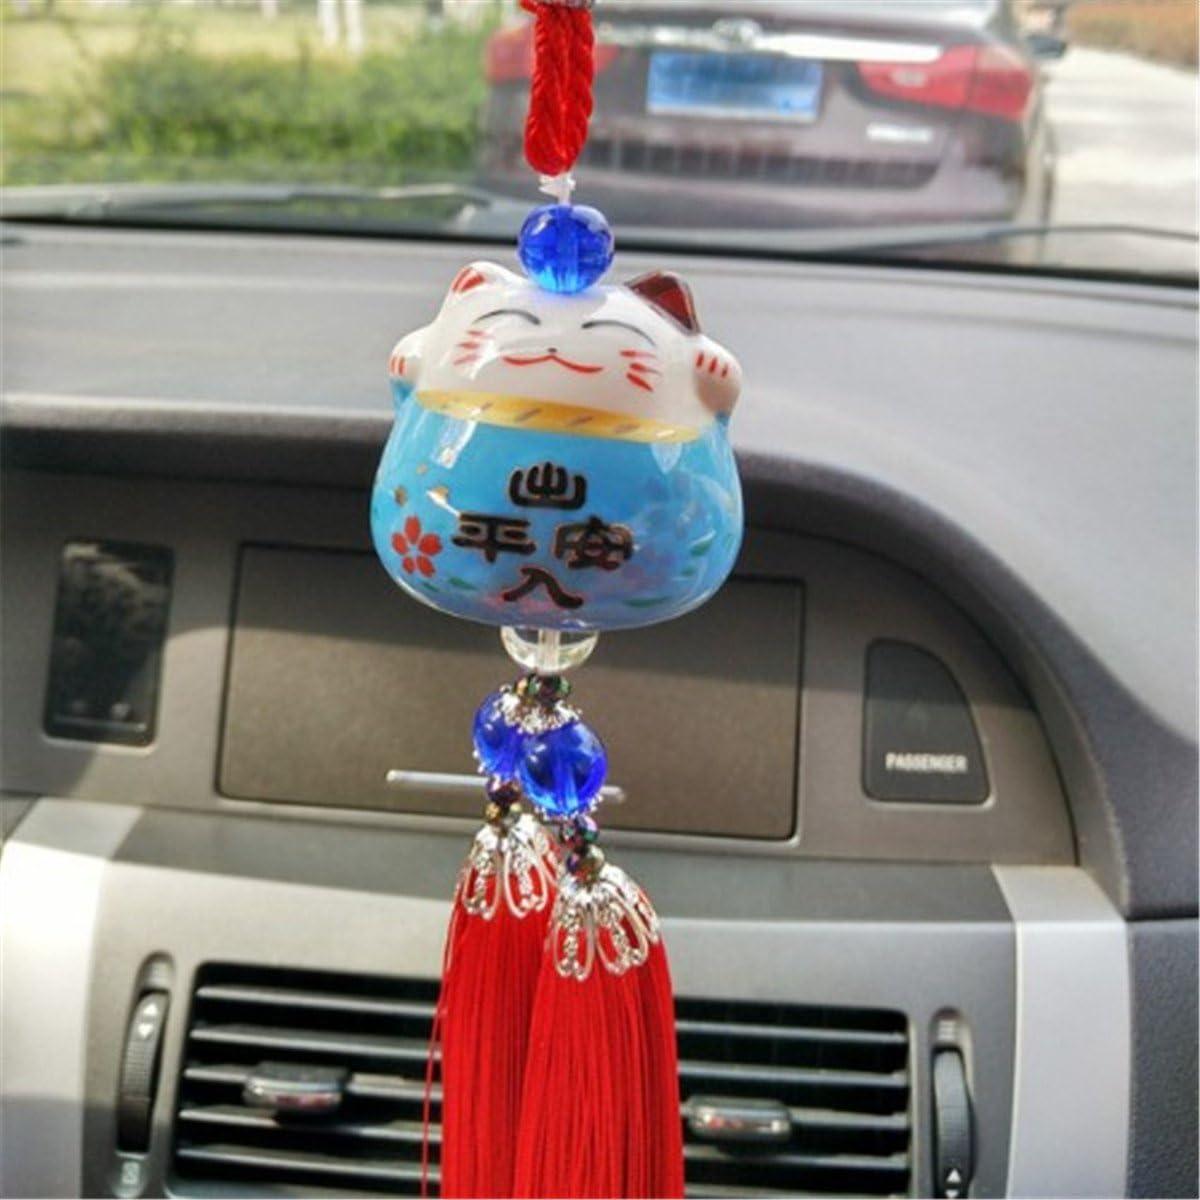 UZHOPM Lucky Cat Car Pendant Chinese Ceramic Car Hanging Ornament Car Interior Decor Pink/&Blue